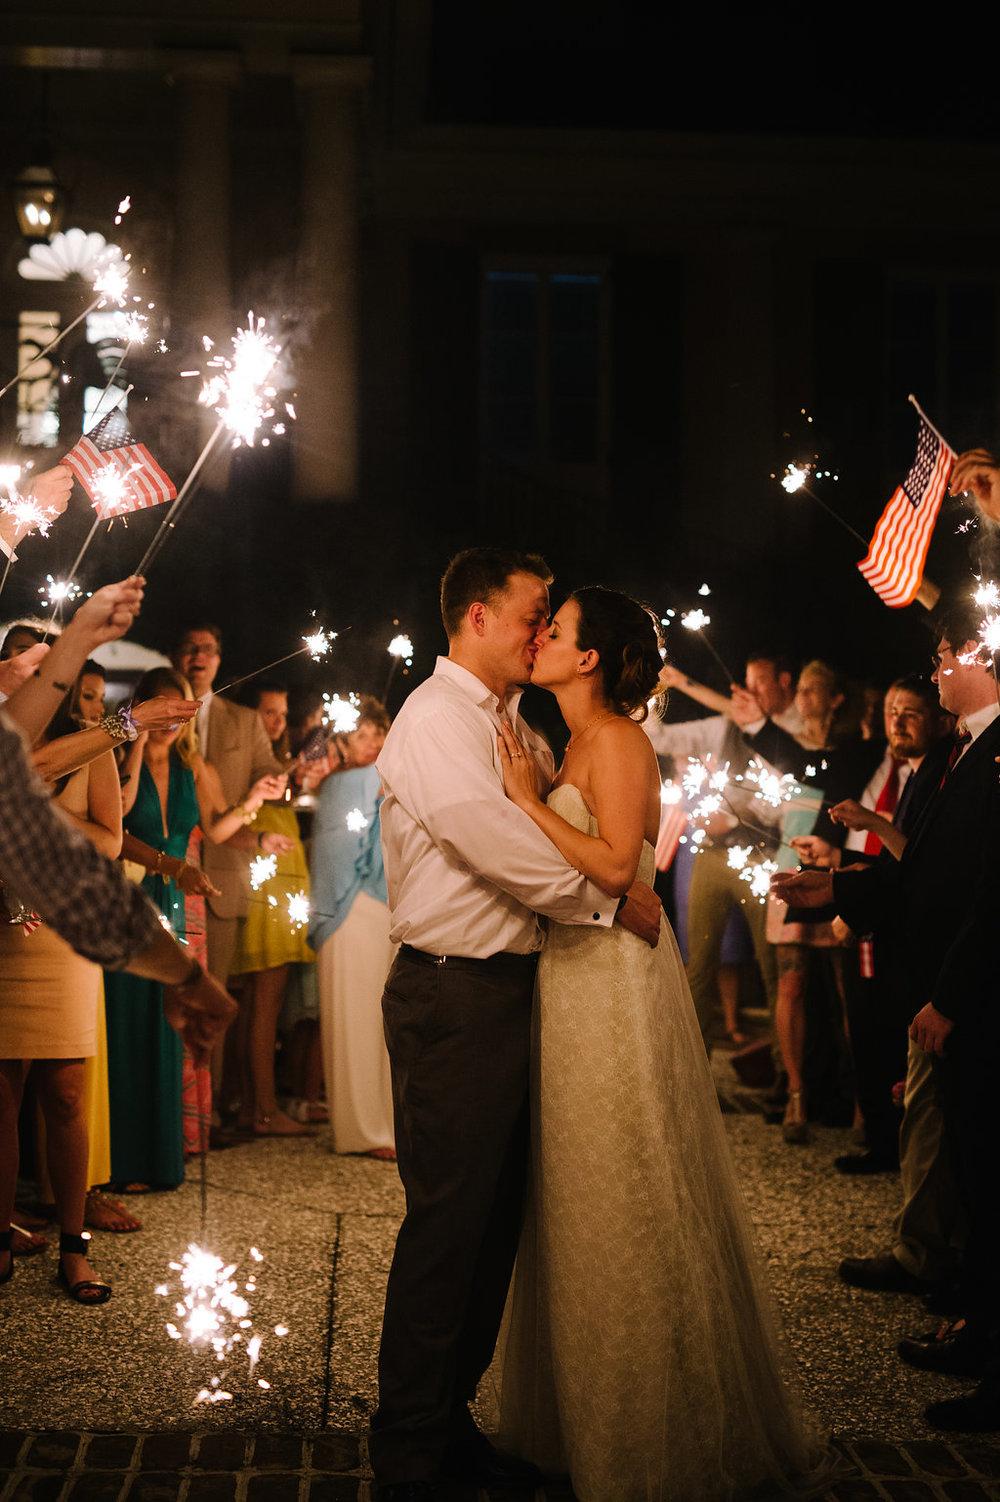 meagan-and-brenden-rach-loves-troy-photography-ivory-and-beau-bridal-boutqiue-ti-adora-wedding-dress-gold-lace-wedding-dress-savannah-wedding-planner-savannah-weddings-oldfield-plantation-wedding-savannah-florist-63.jpg